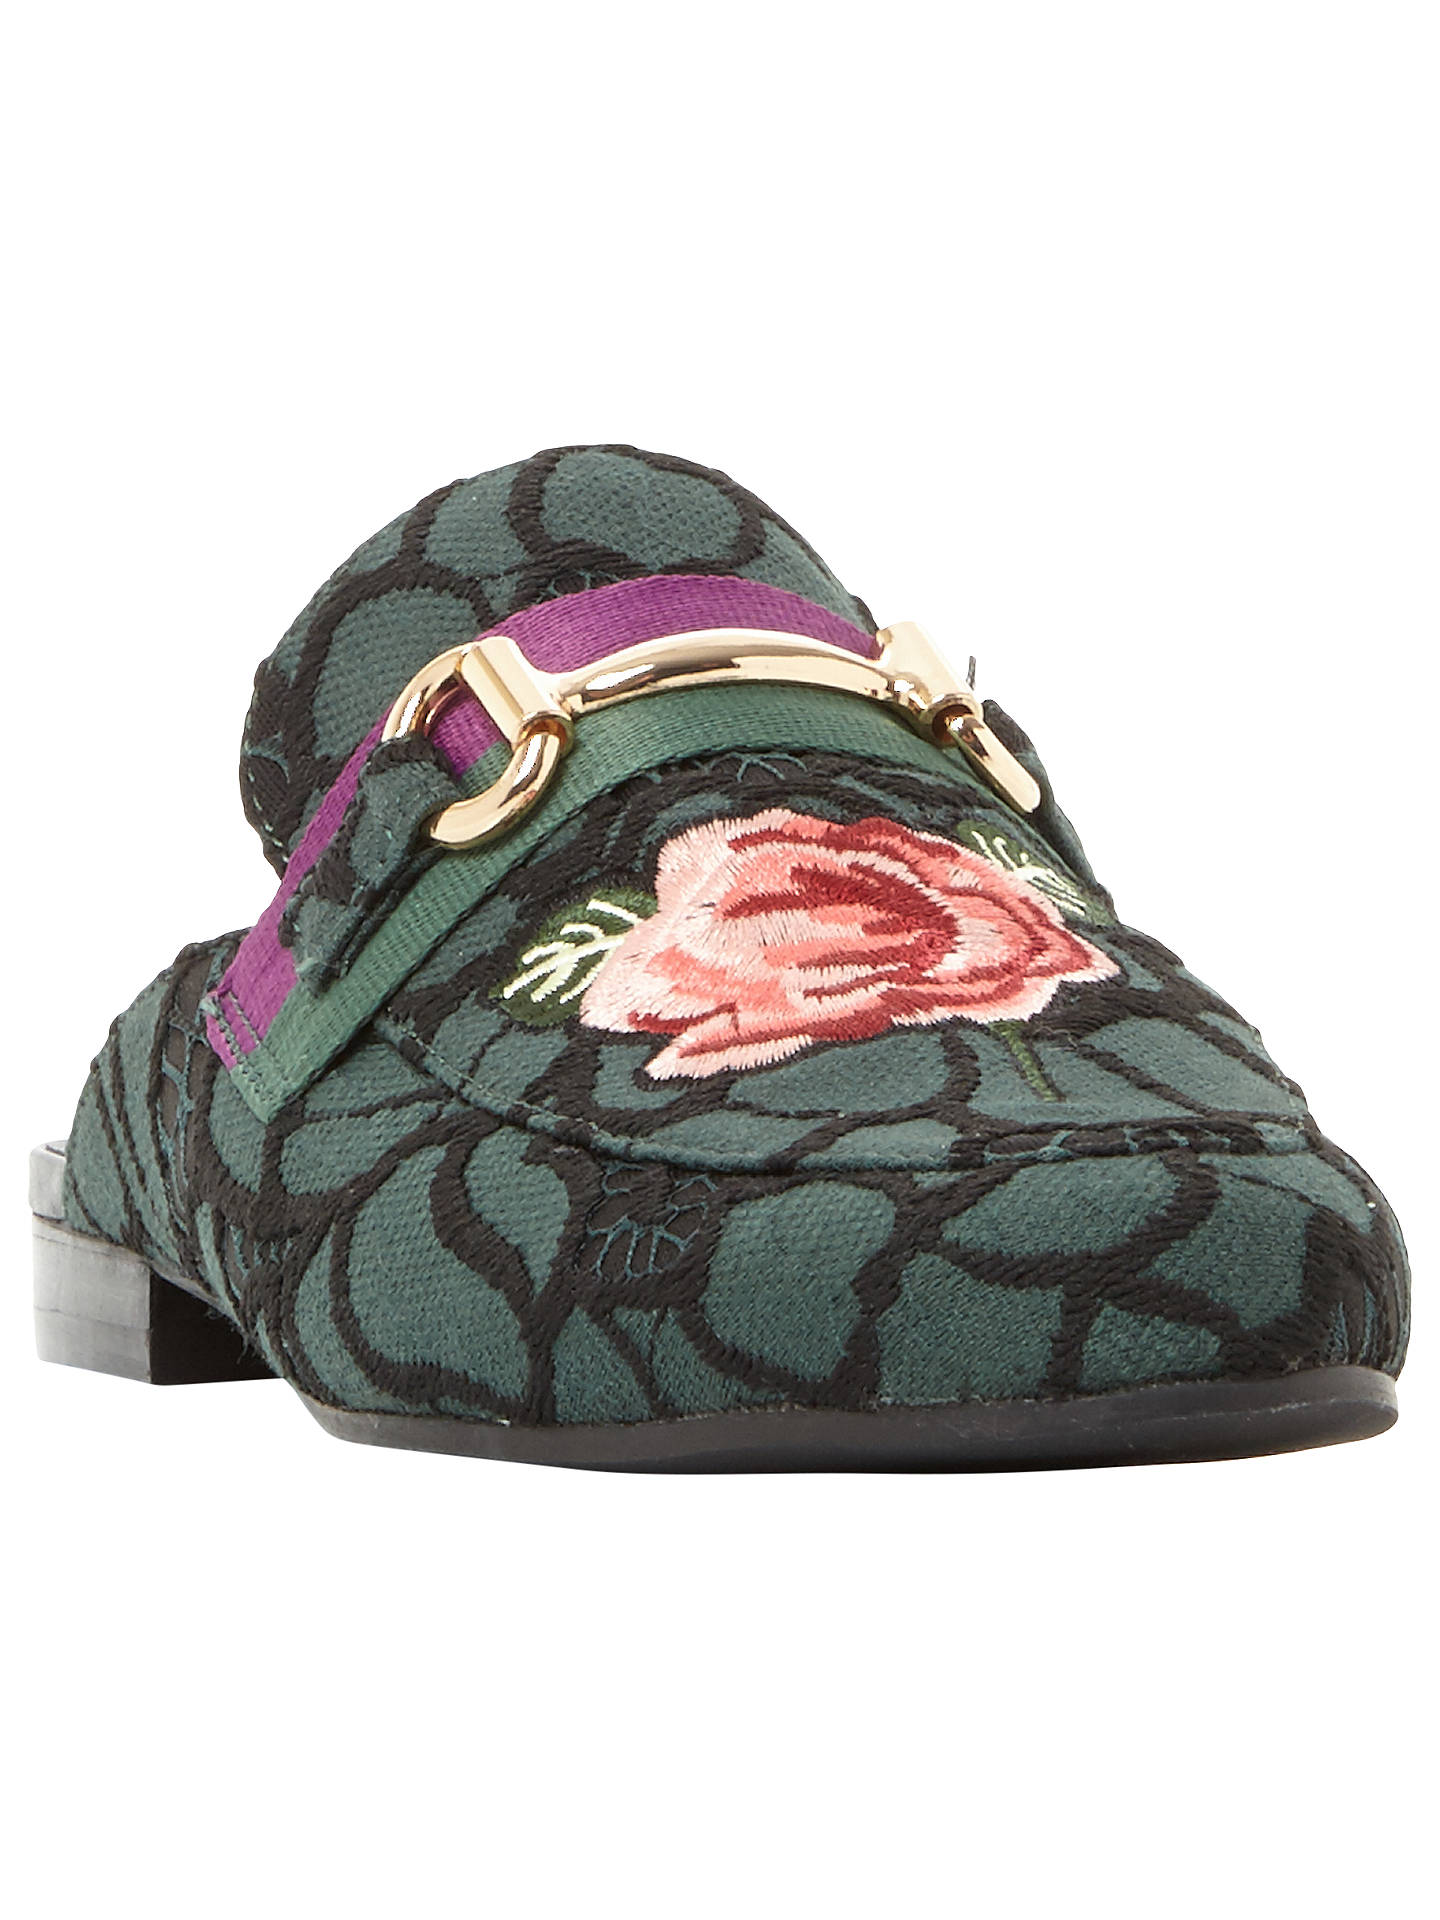 d5a79d92c127 Buy Steve Madden Kandi Mule Loafers